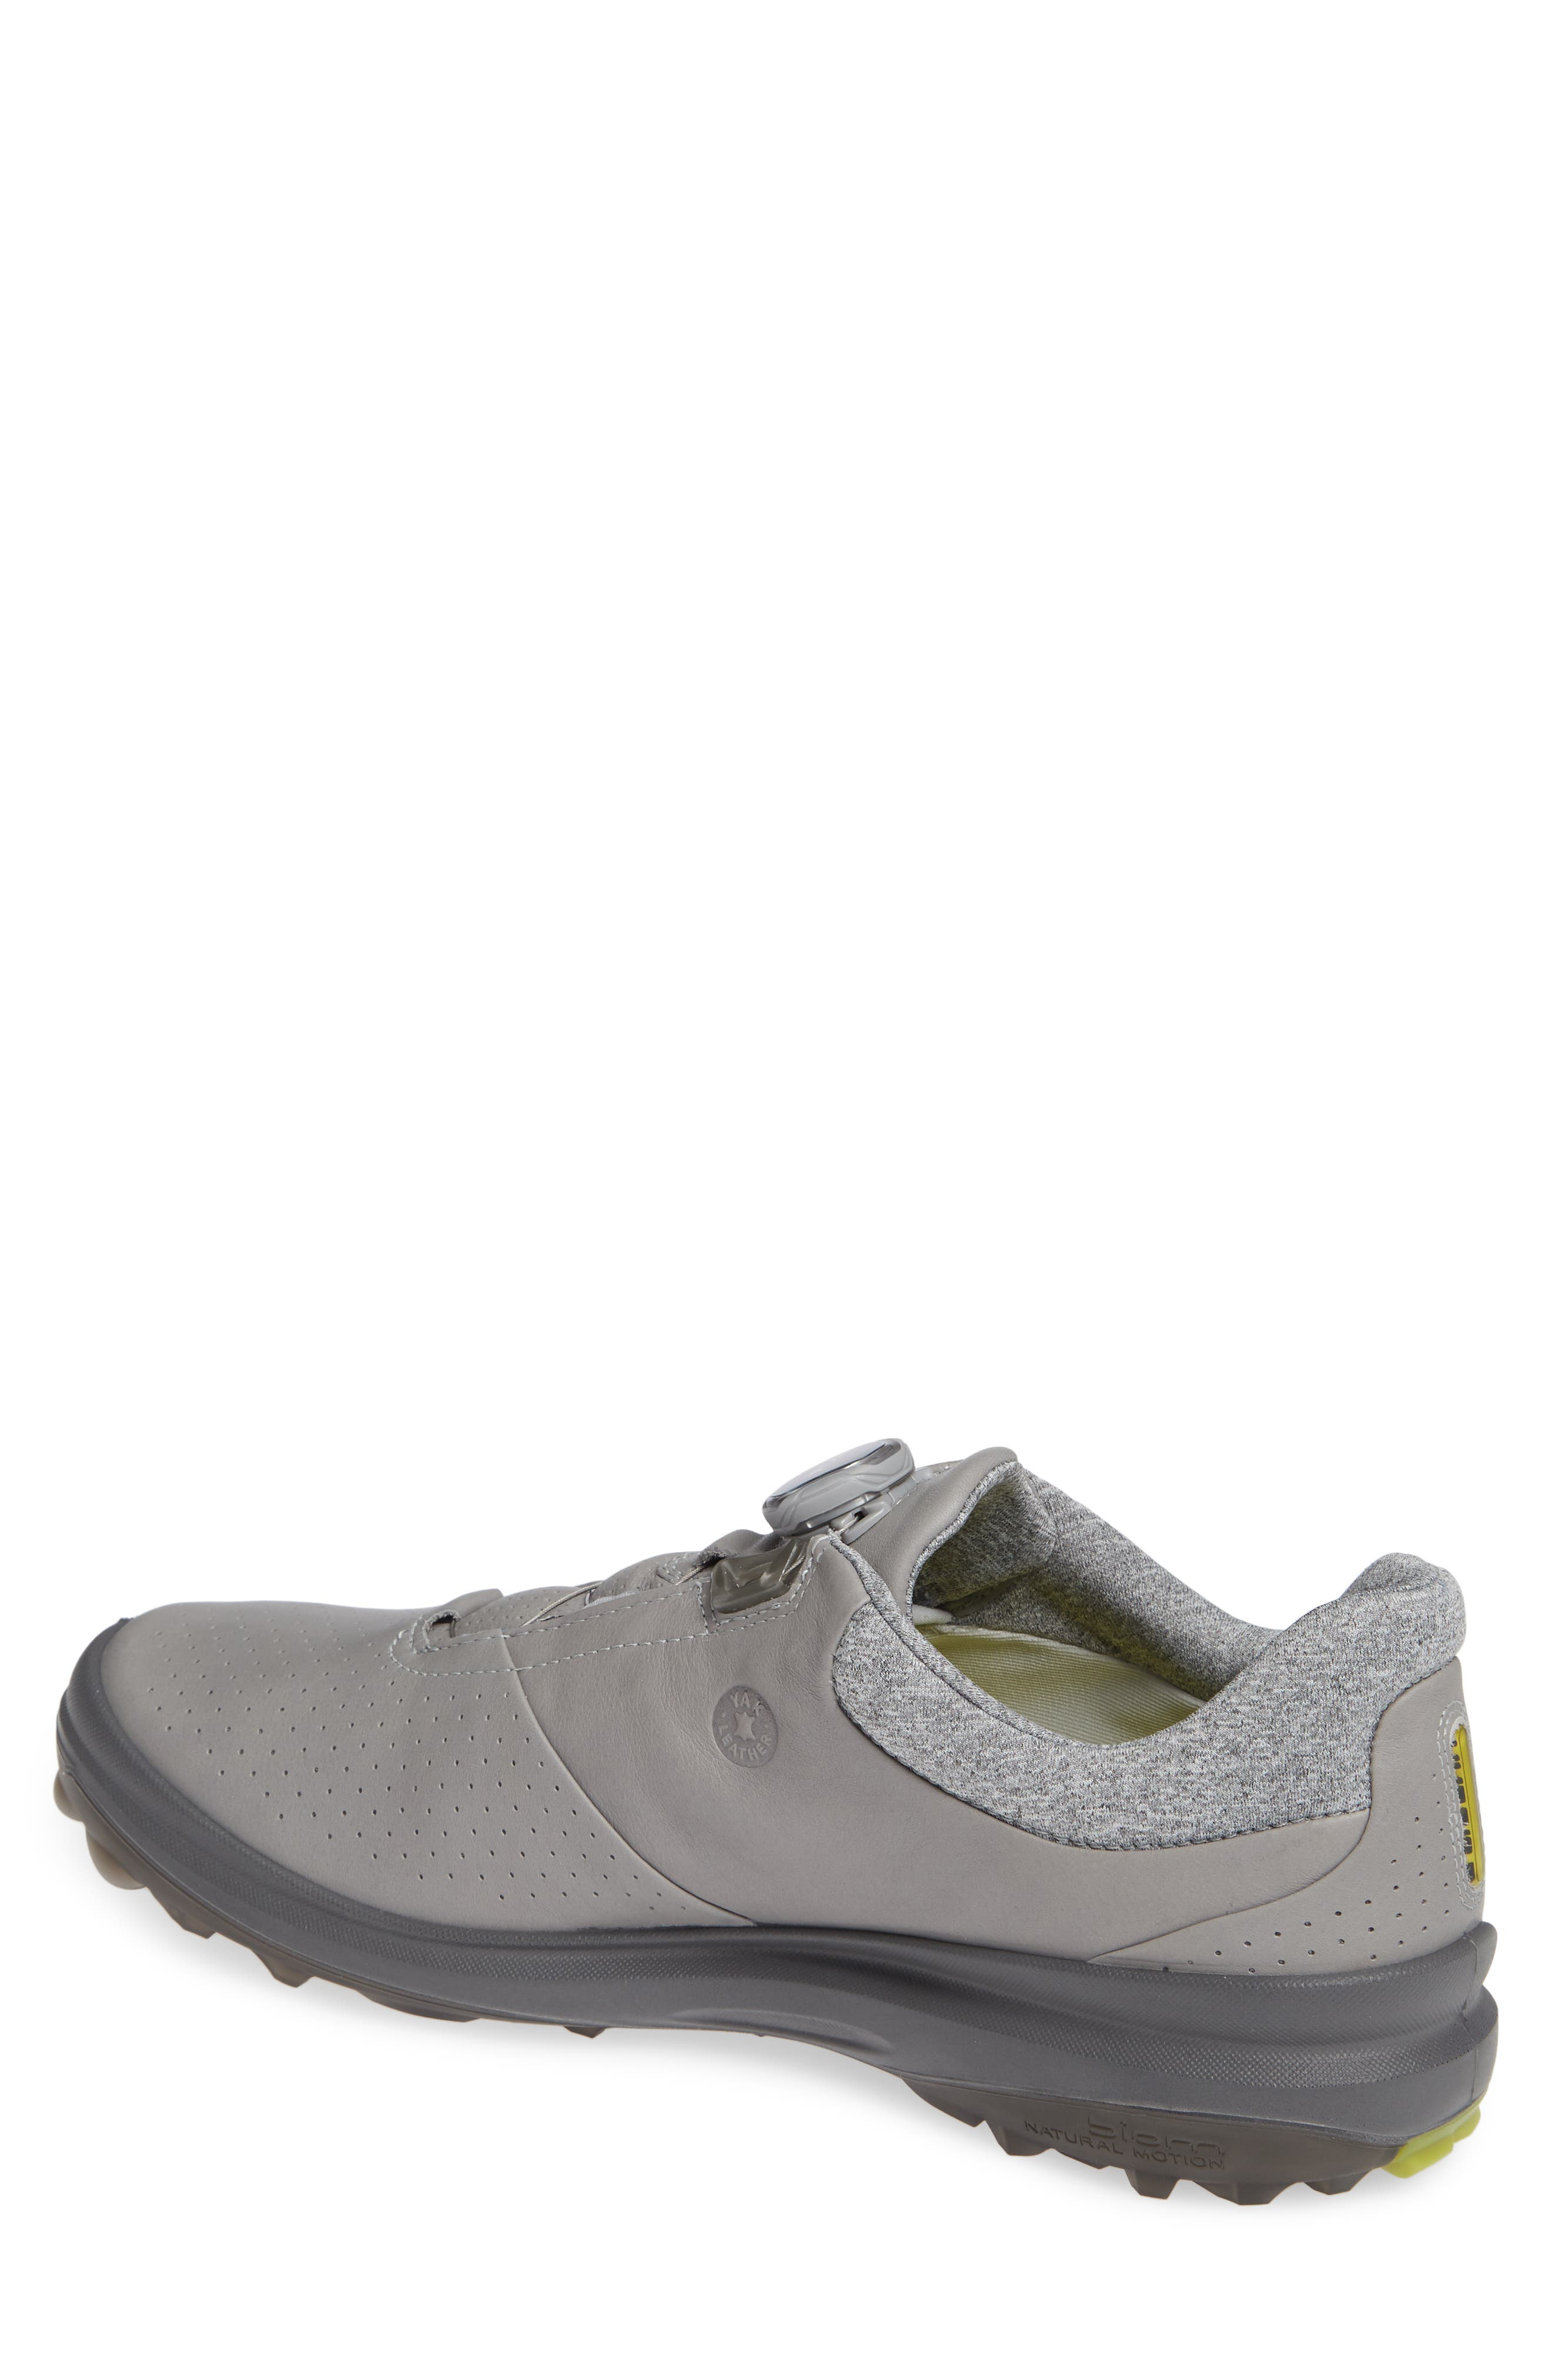 ECCO,                             BIOM Hybrid 3 Gore-Tex<sup>®</sup> Golf Shoe,                             Alternate thumbnail 2, color,                             WILD DOVE/ KIWI LEATHER